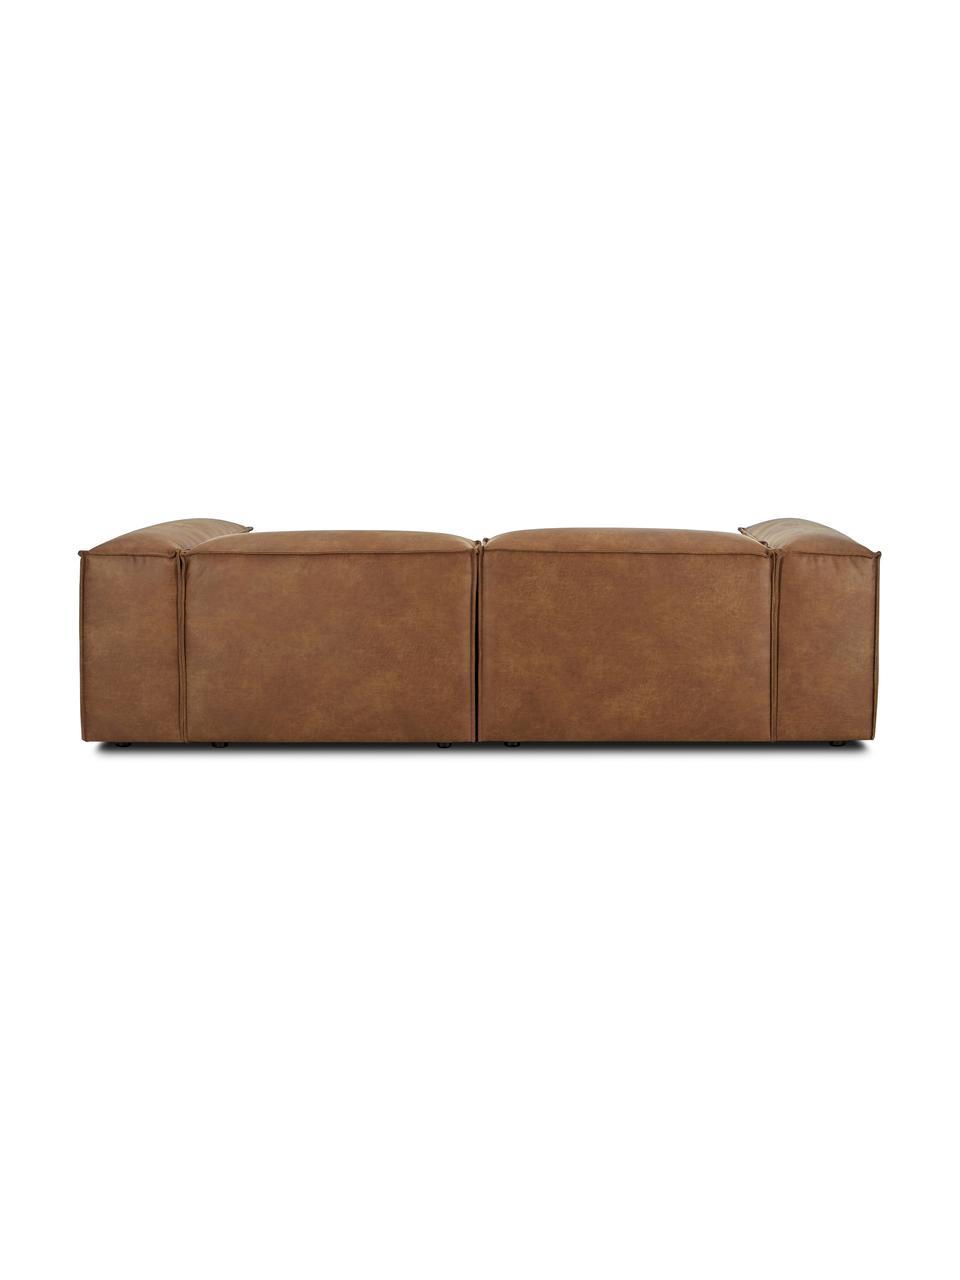 Modulaire hoekbank Lennon in bruin van gerecycled leer, Bekleding: gerecycled leer (70% leer, Frame: massief grenenhout, multi, Poten: kunststof, Leer bruin, B 238 x D 180 cm